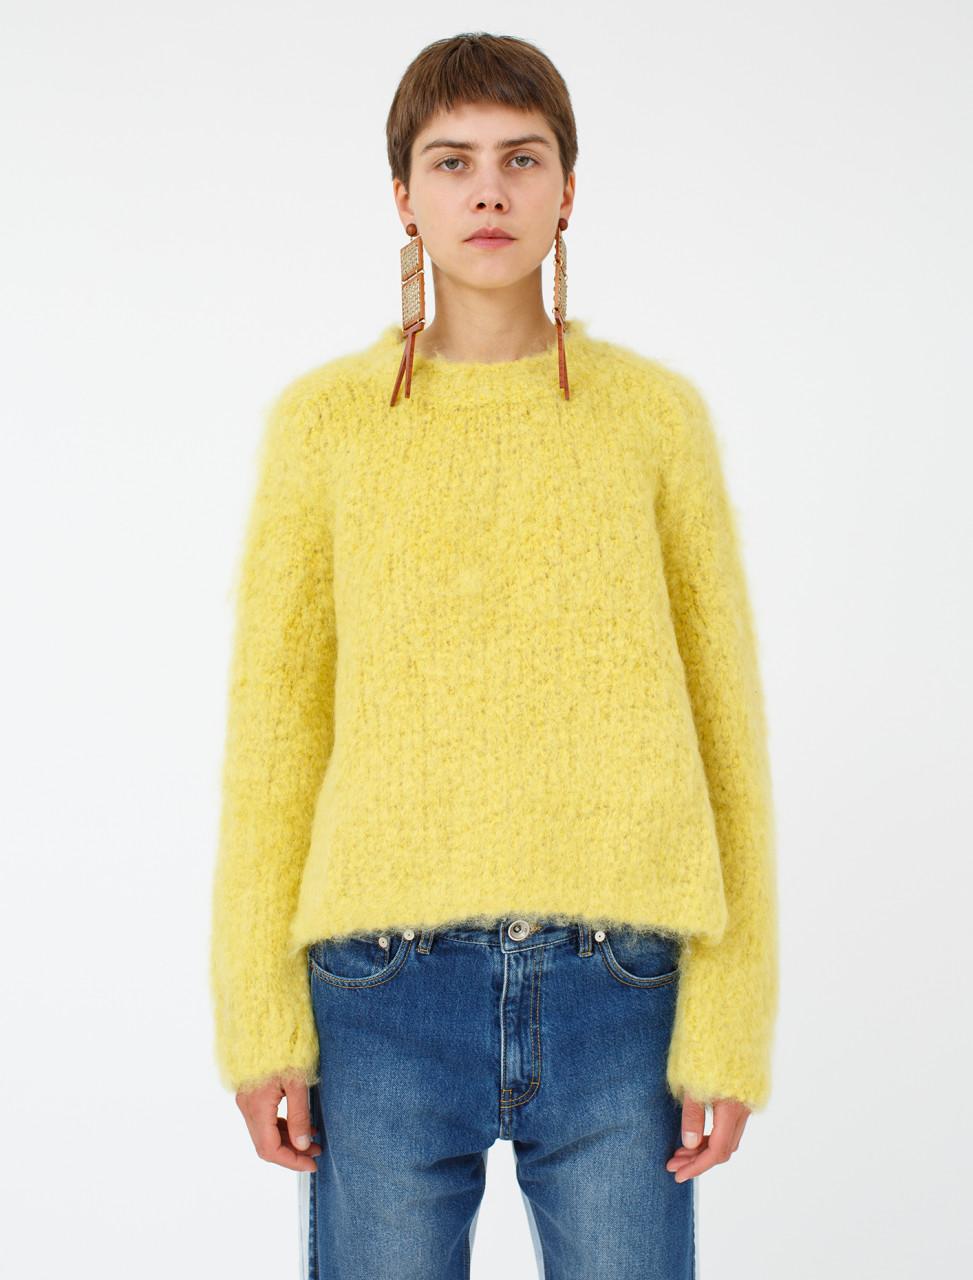 Wool Mohair Sweater in Yellow